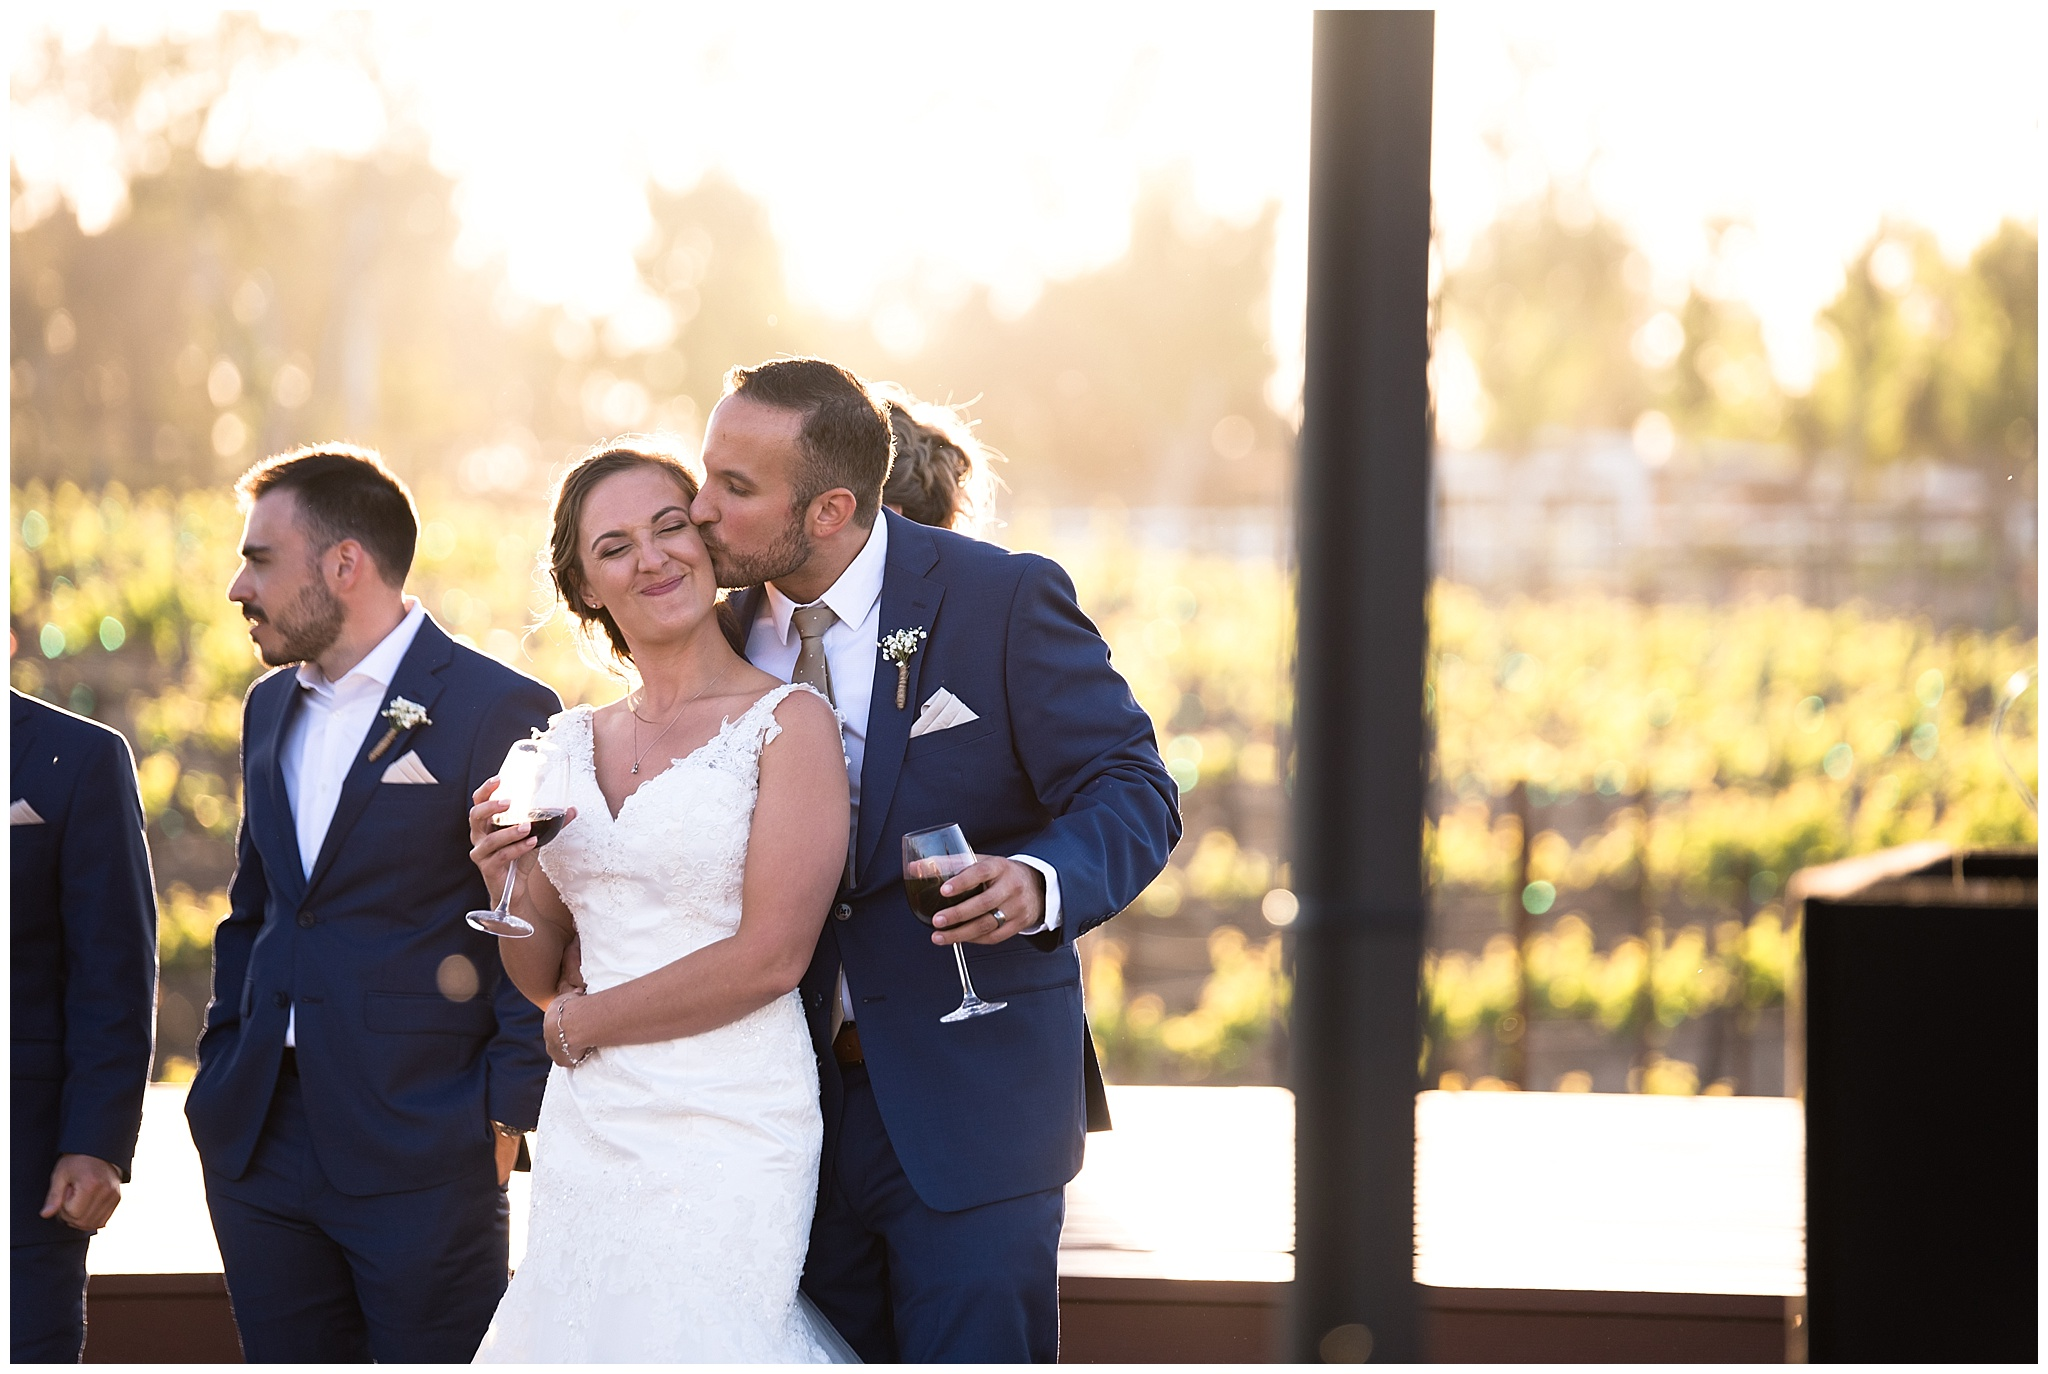 Vinny-Cayt-Wedding-4-26-18-2752.jpg